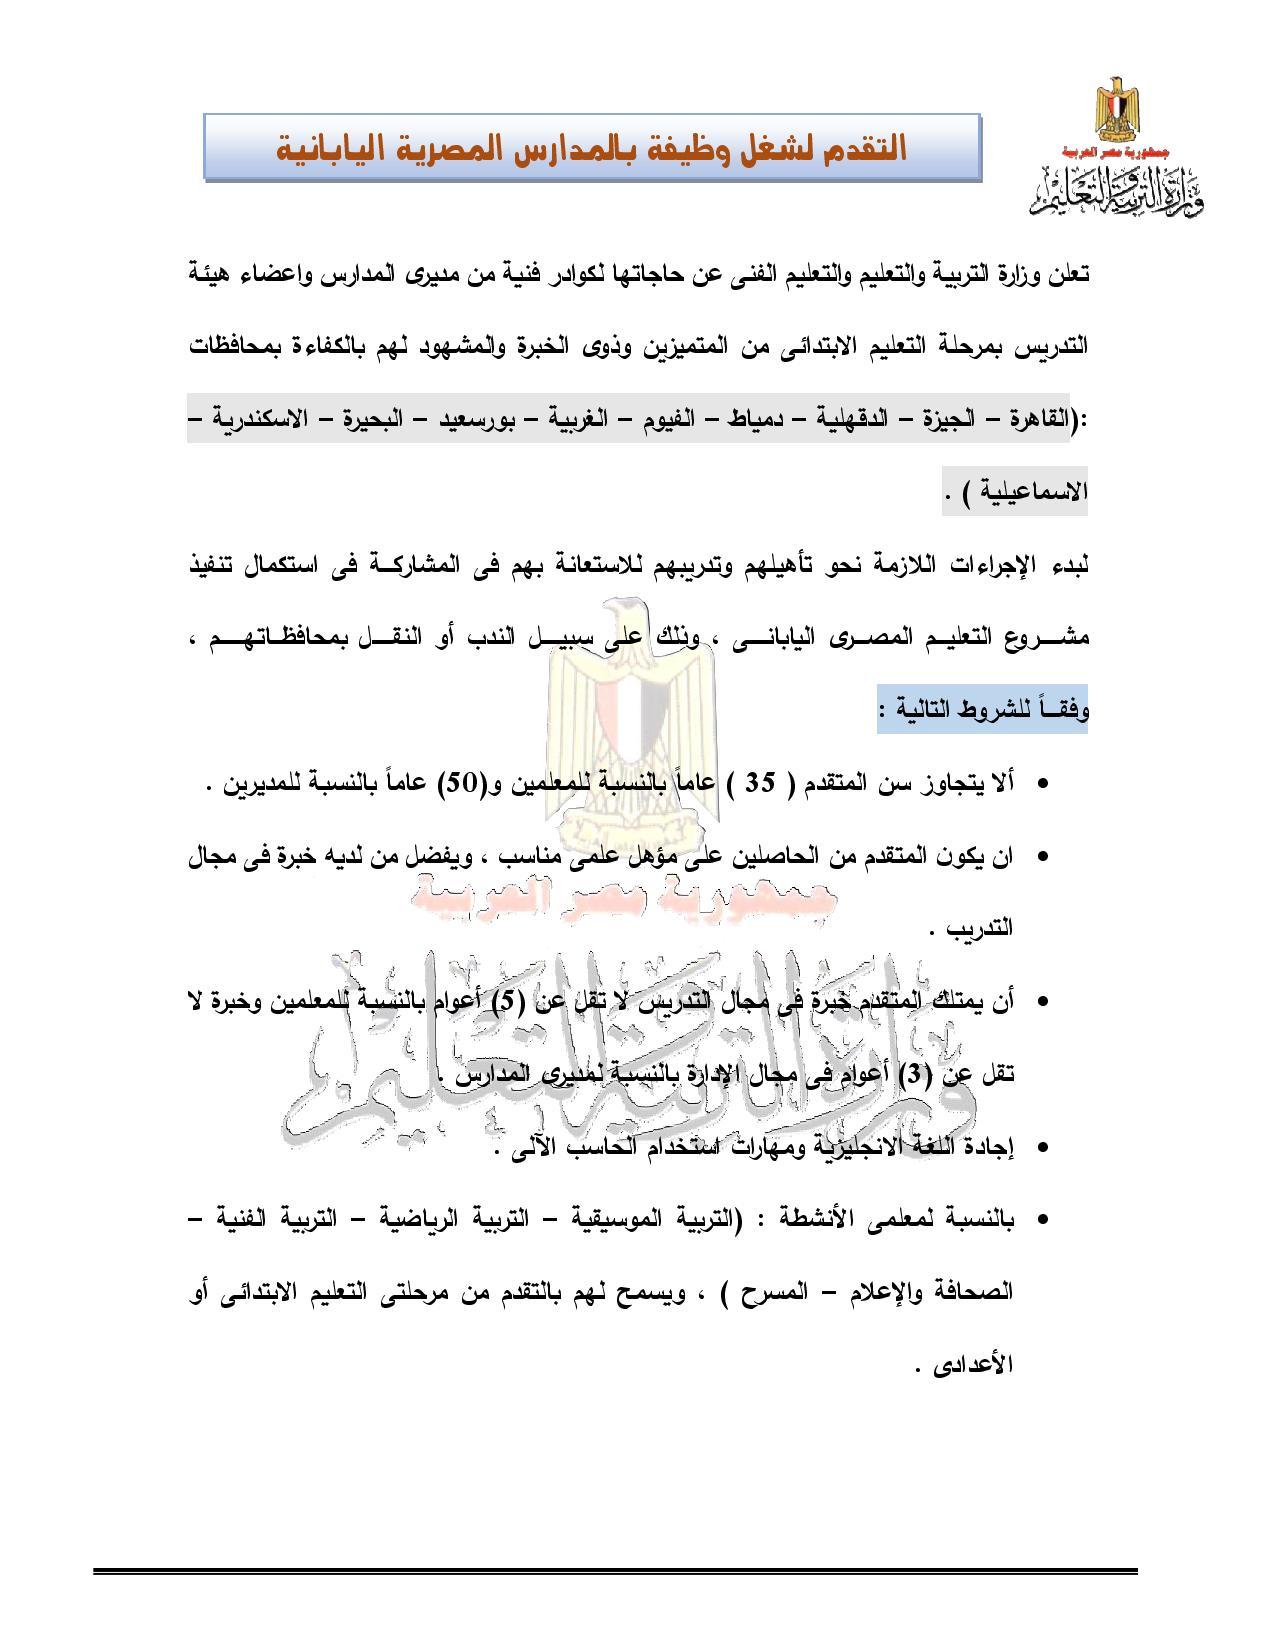 exam-eg.com_1458256355431.jpg